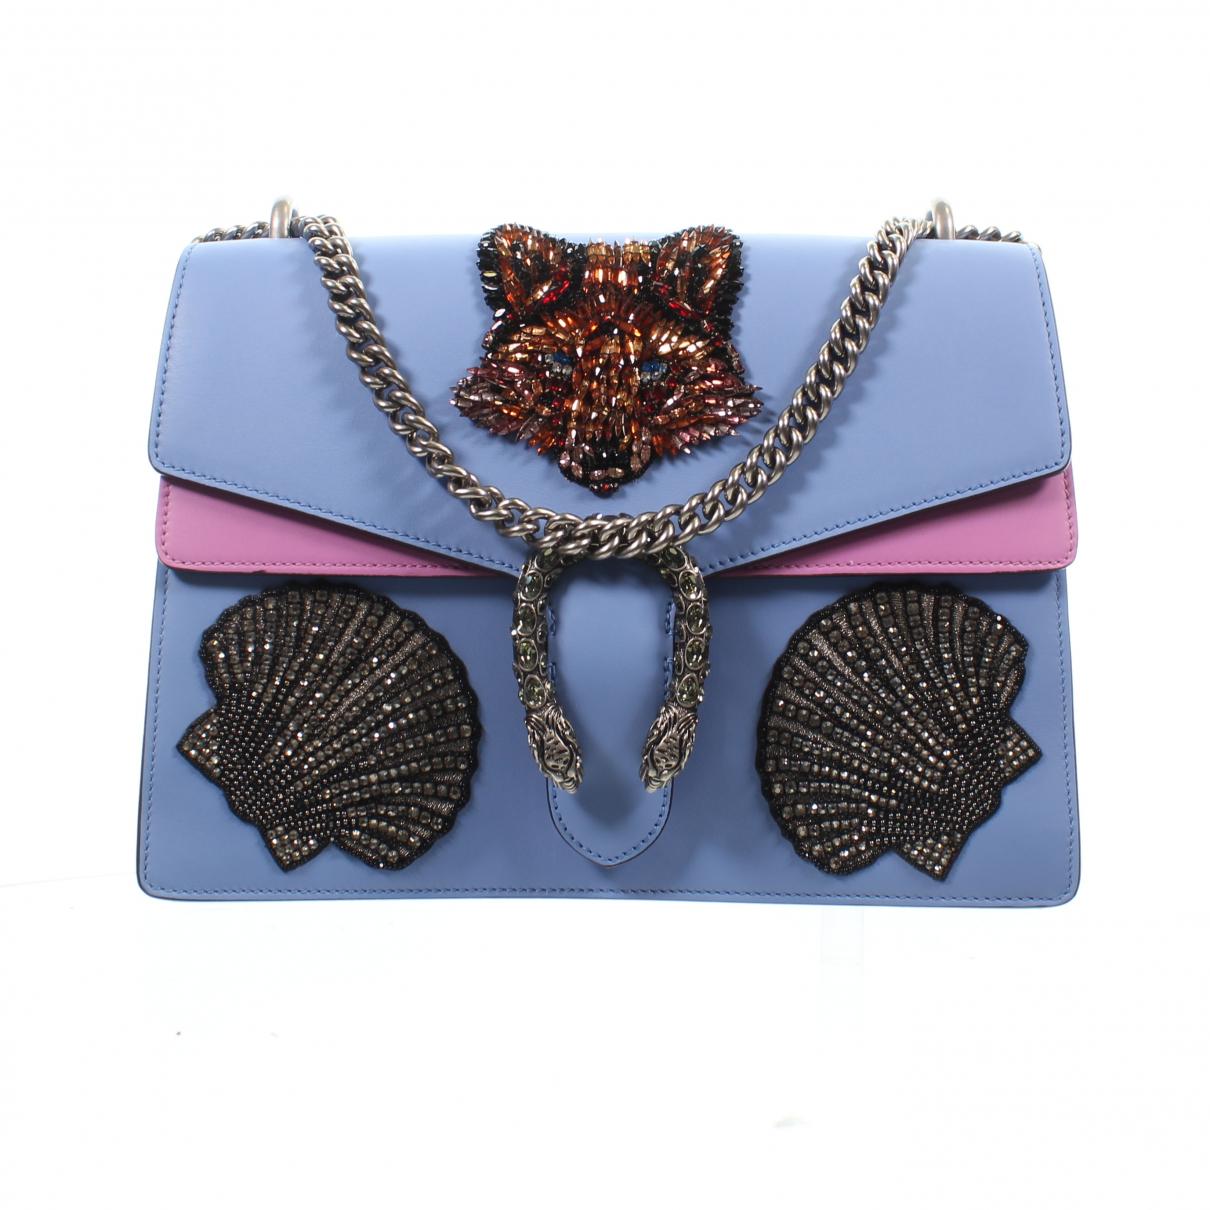 Gucci Dionysus Multicolour Leather handbag for Women N